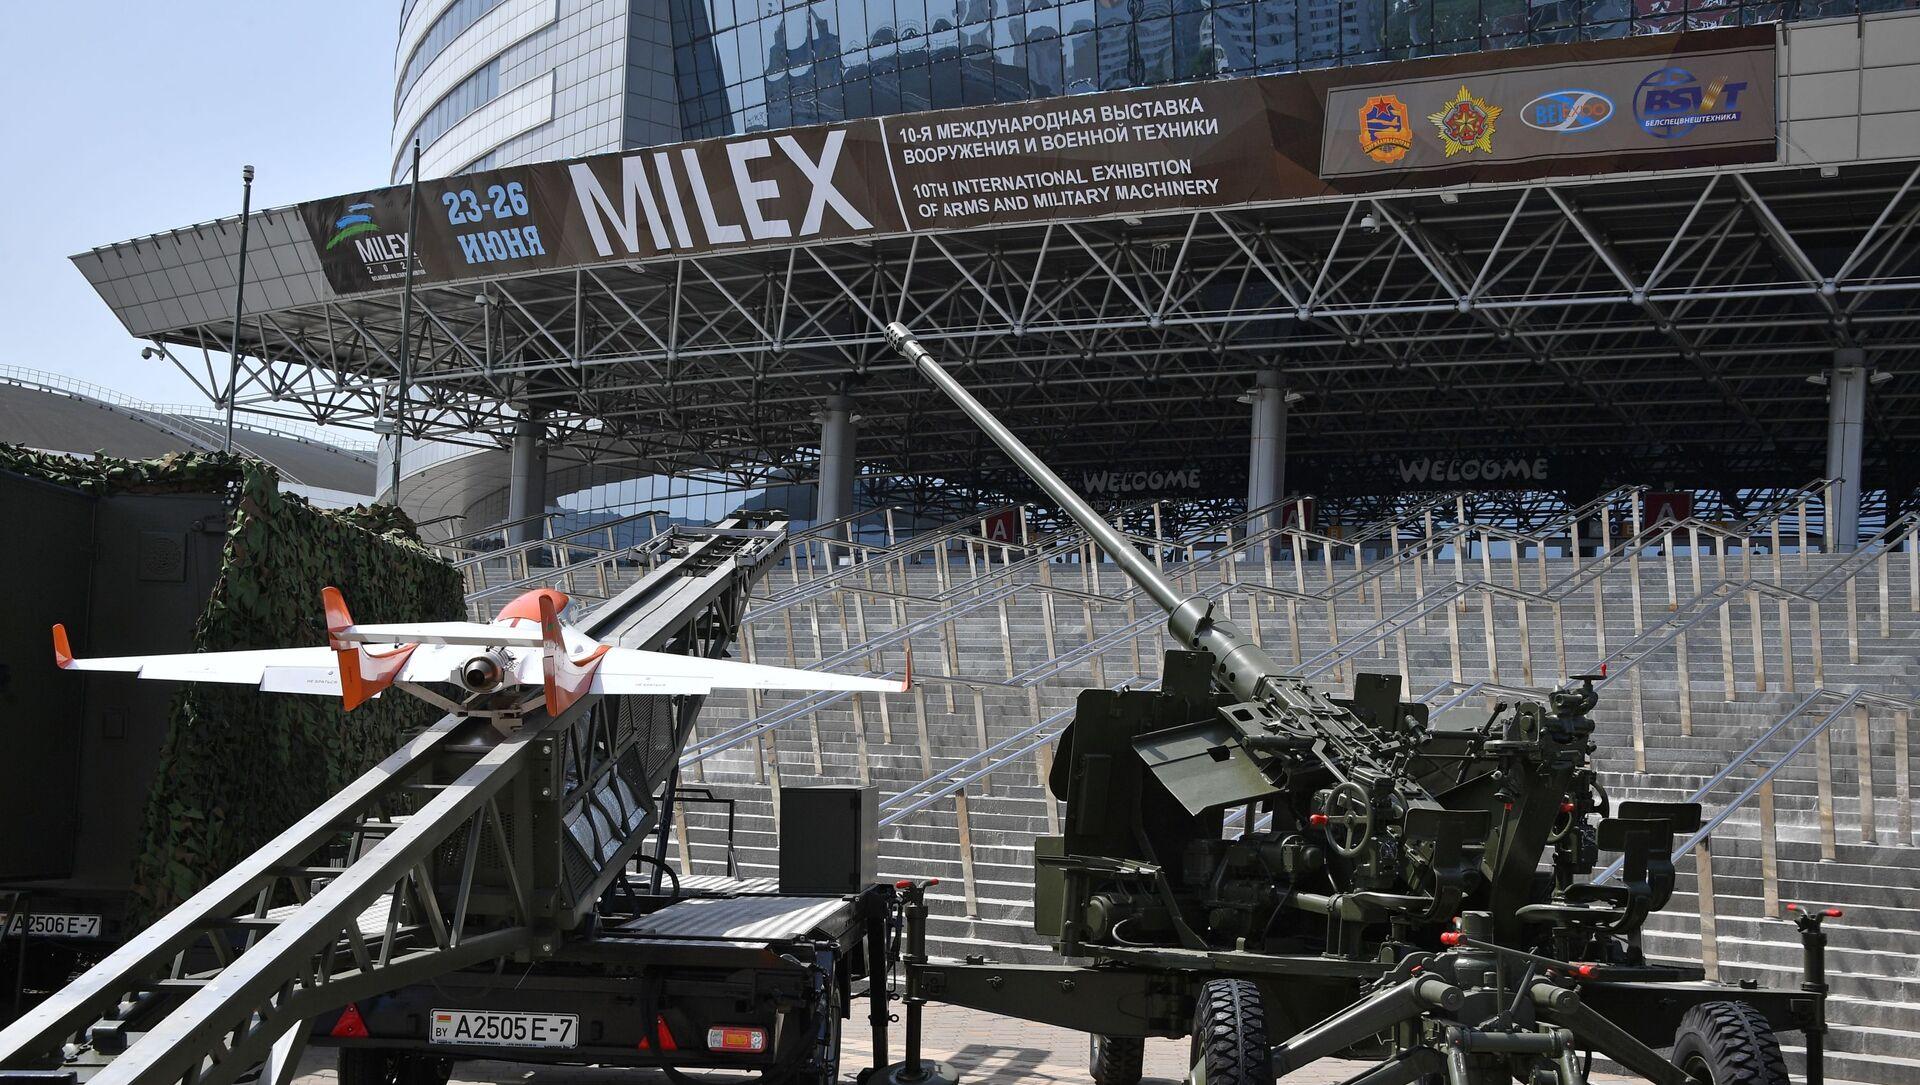 Minskdə MILEX–2021 - Sputnik Азербайджан, 1920, 24.06.2021